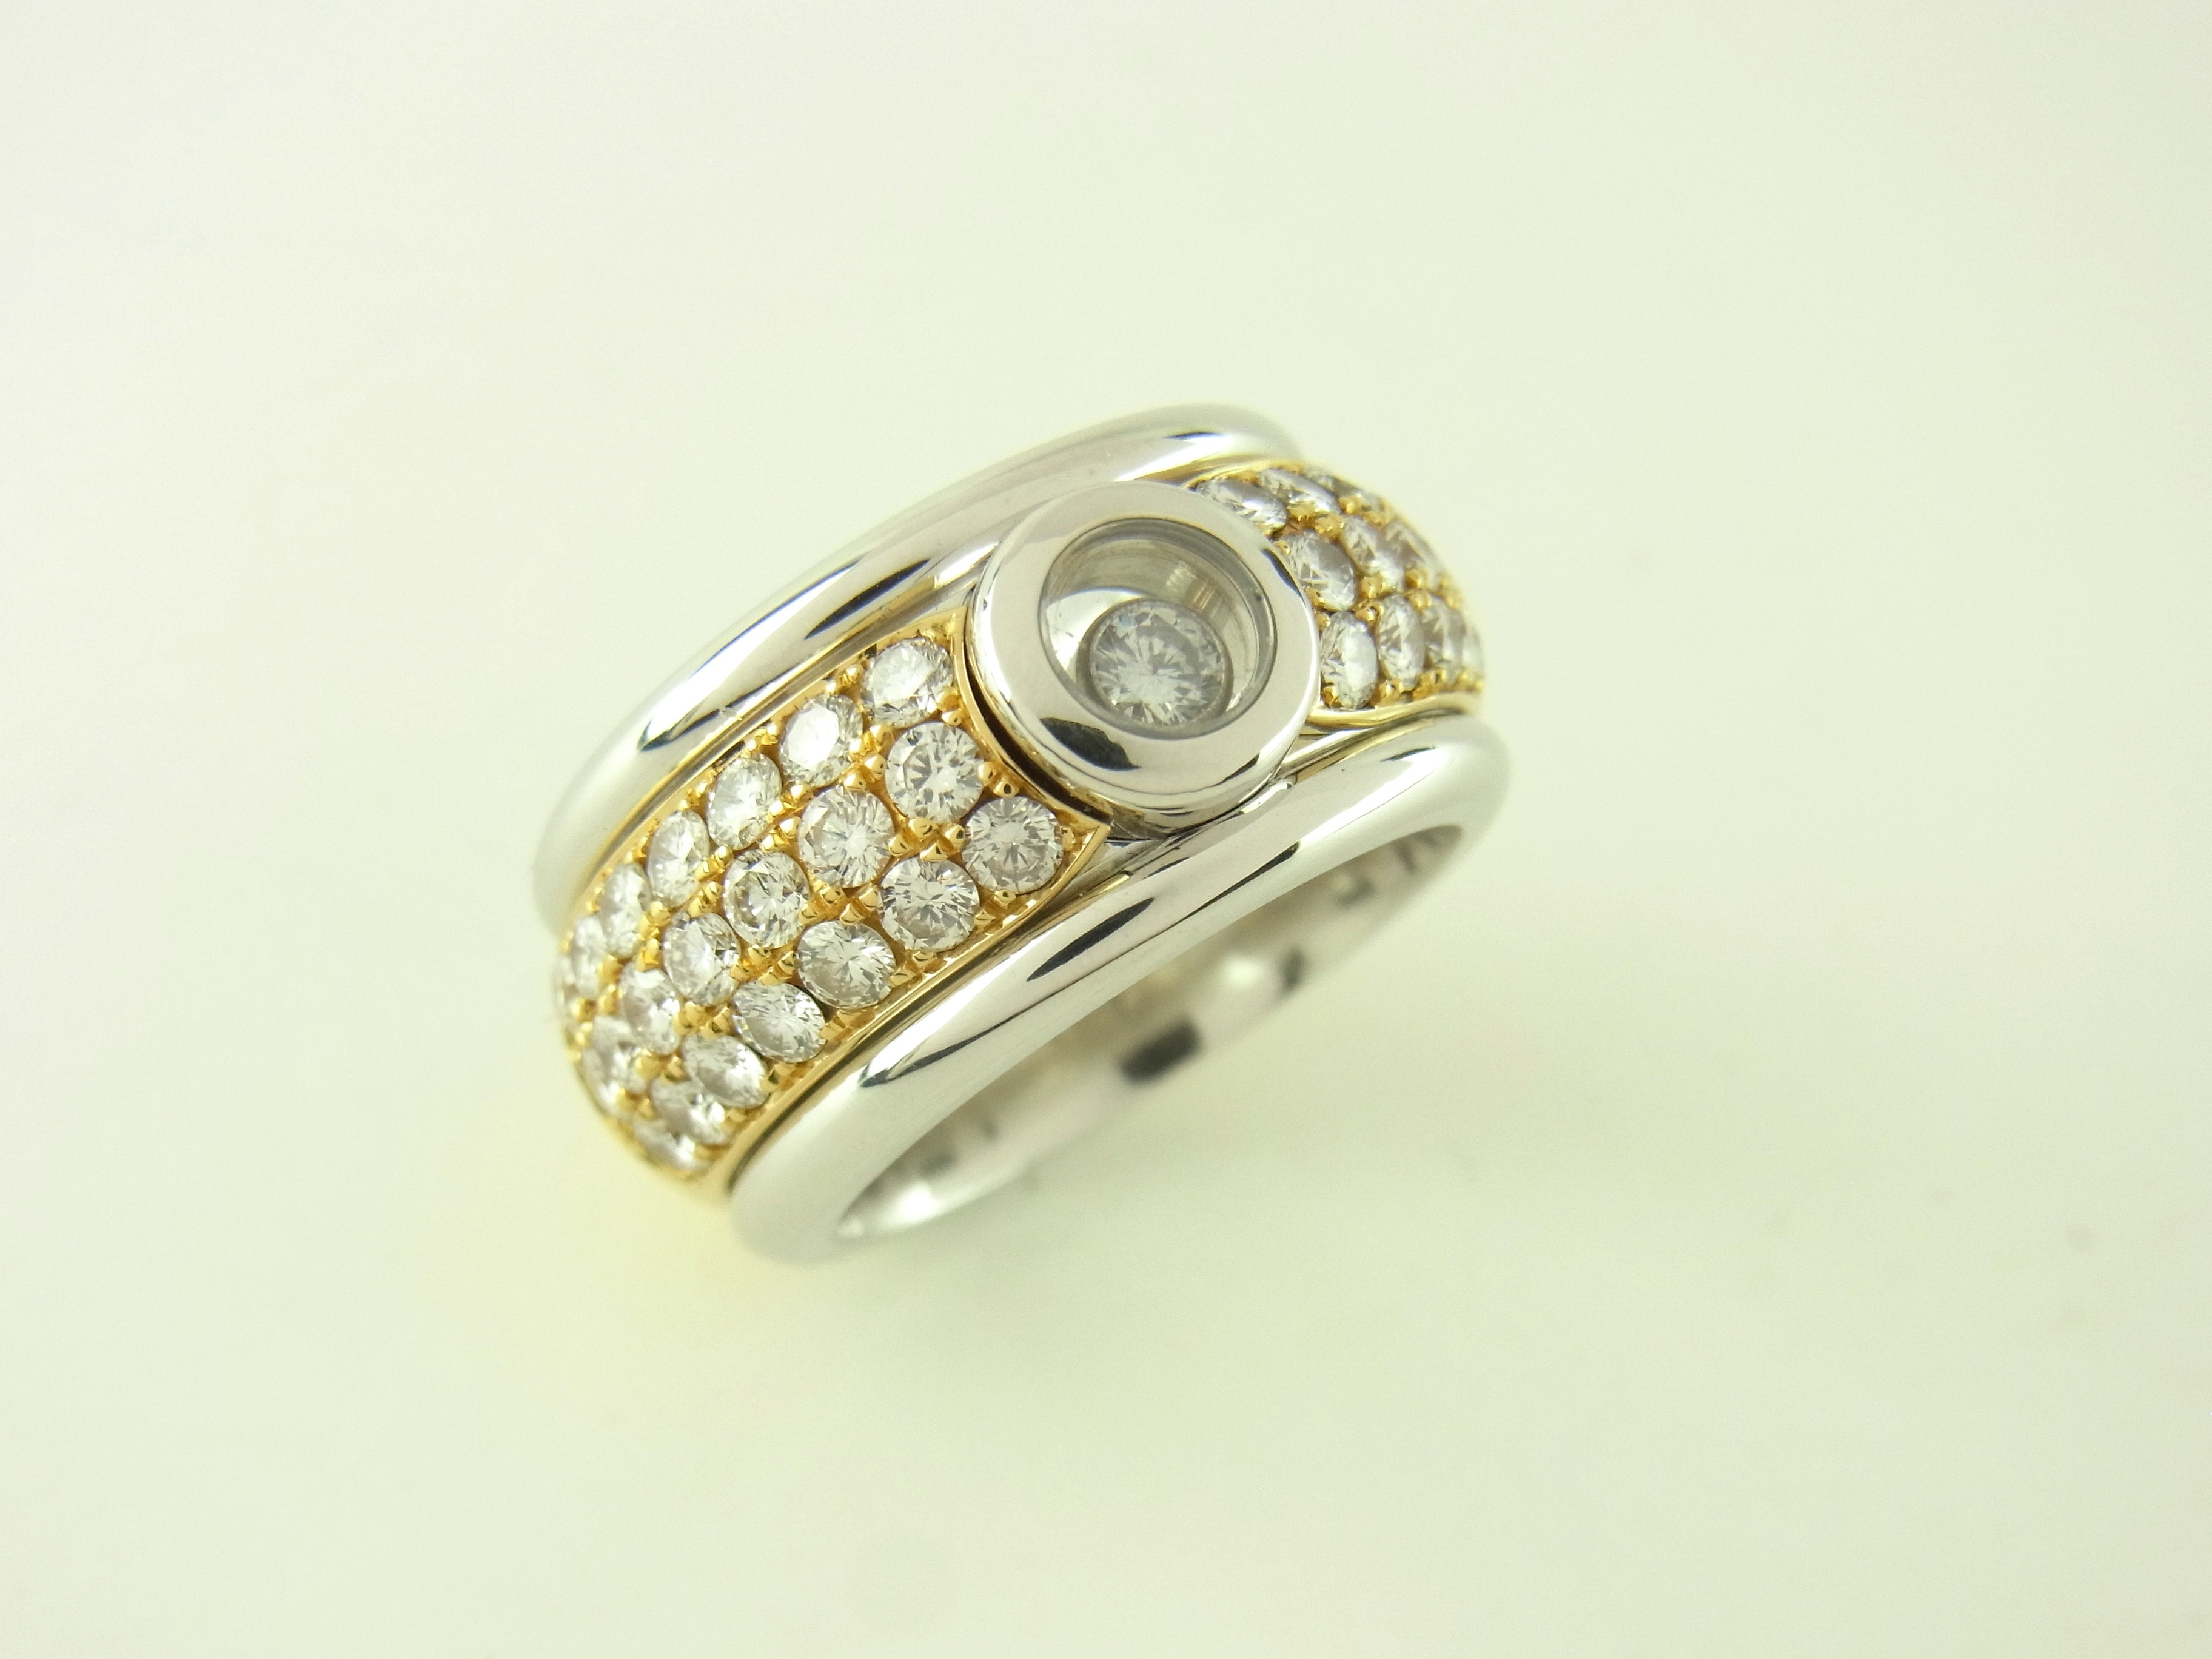 Diamantring gold  Chopard Happy Sport Diamant Ring 750er Gold 42 Diamanten 1.30 Ct ...